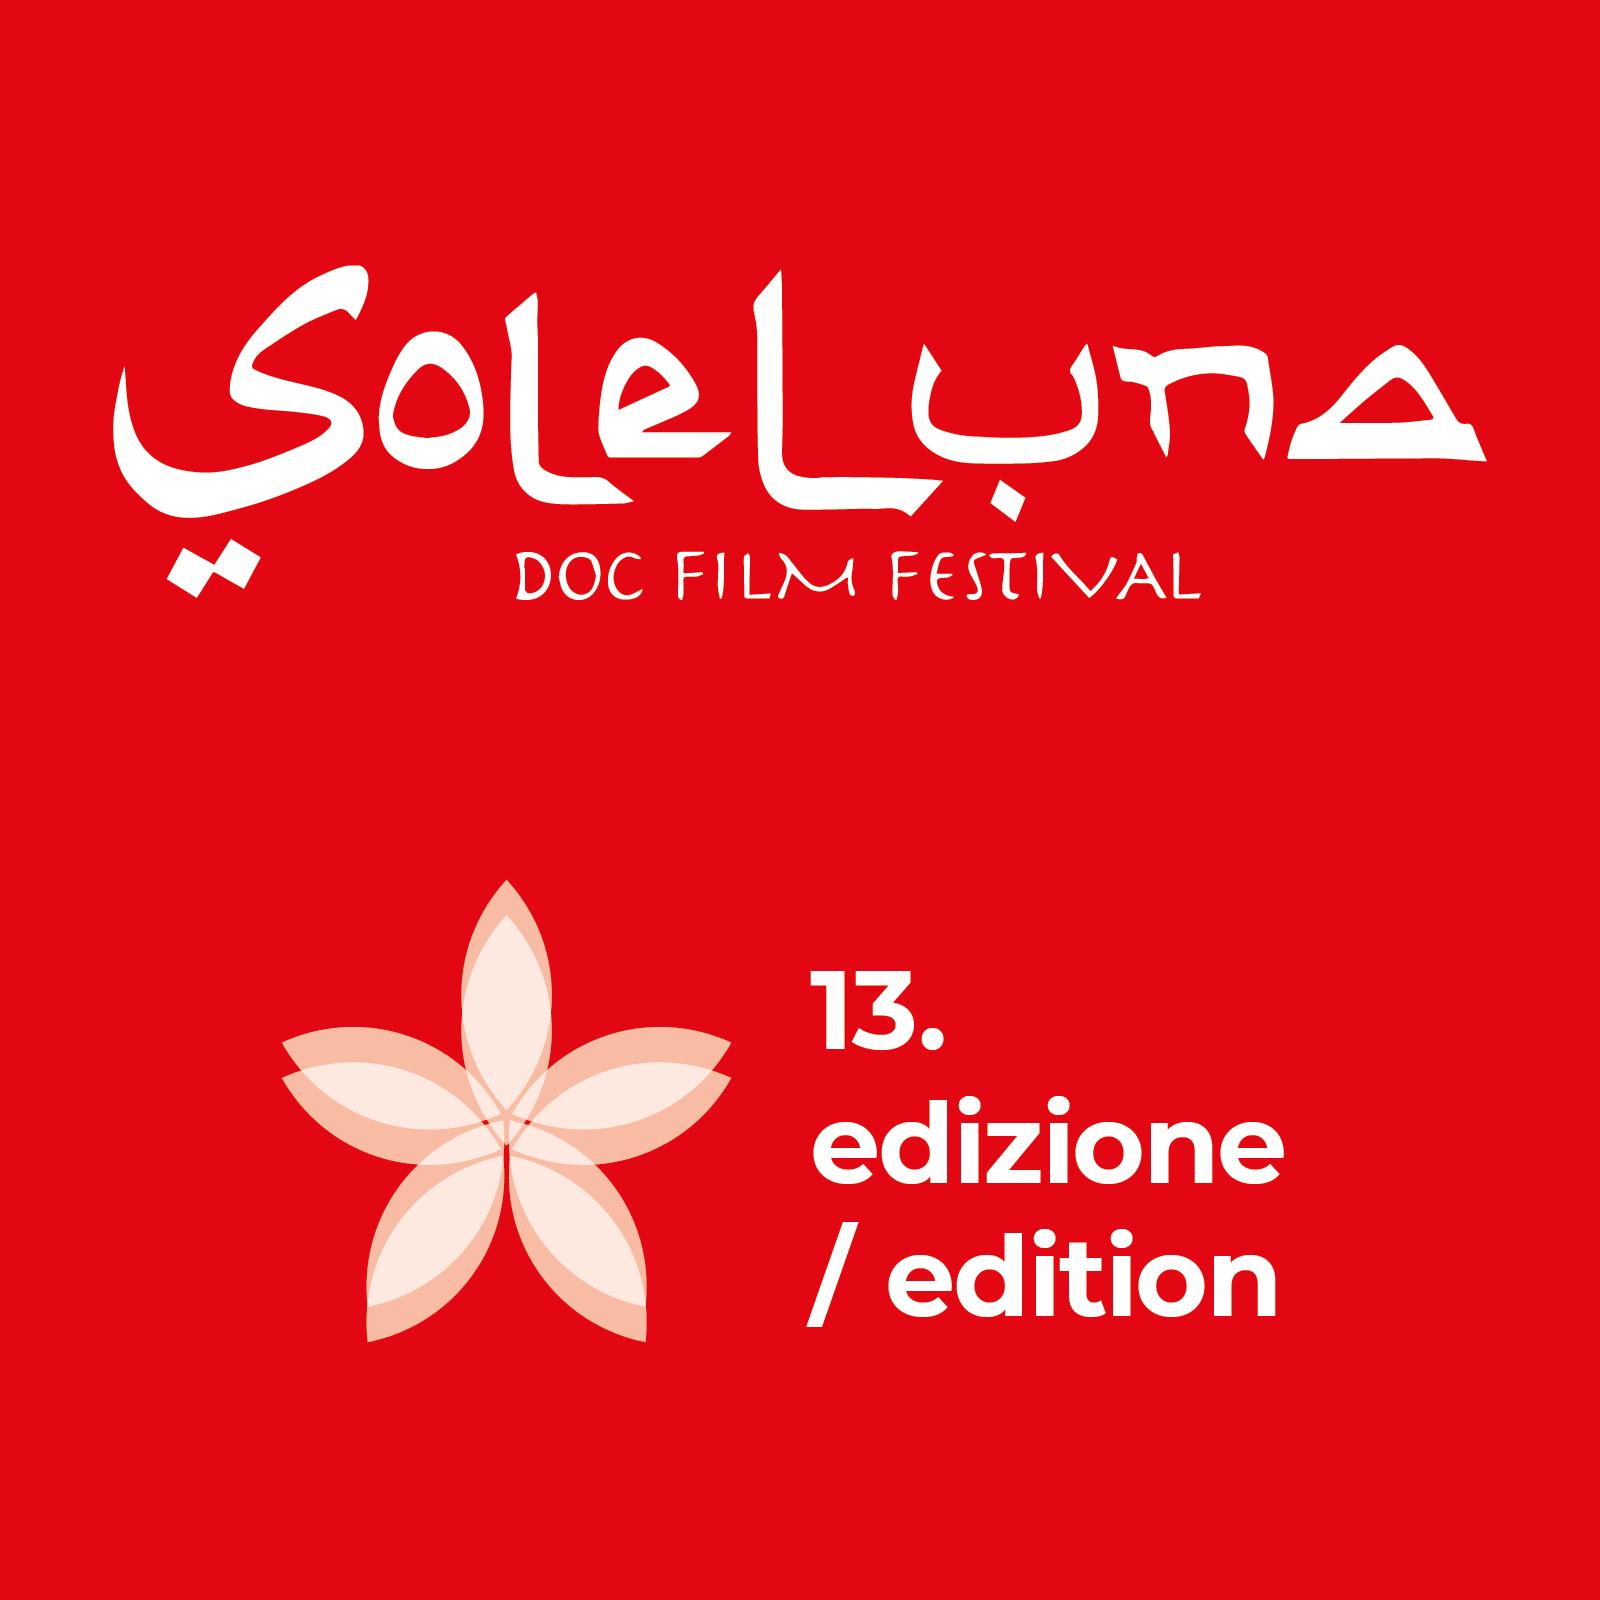 2018_Soleluna18.jpg - 433.42 kB